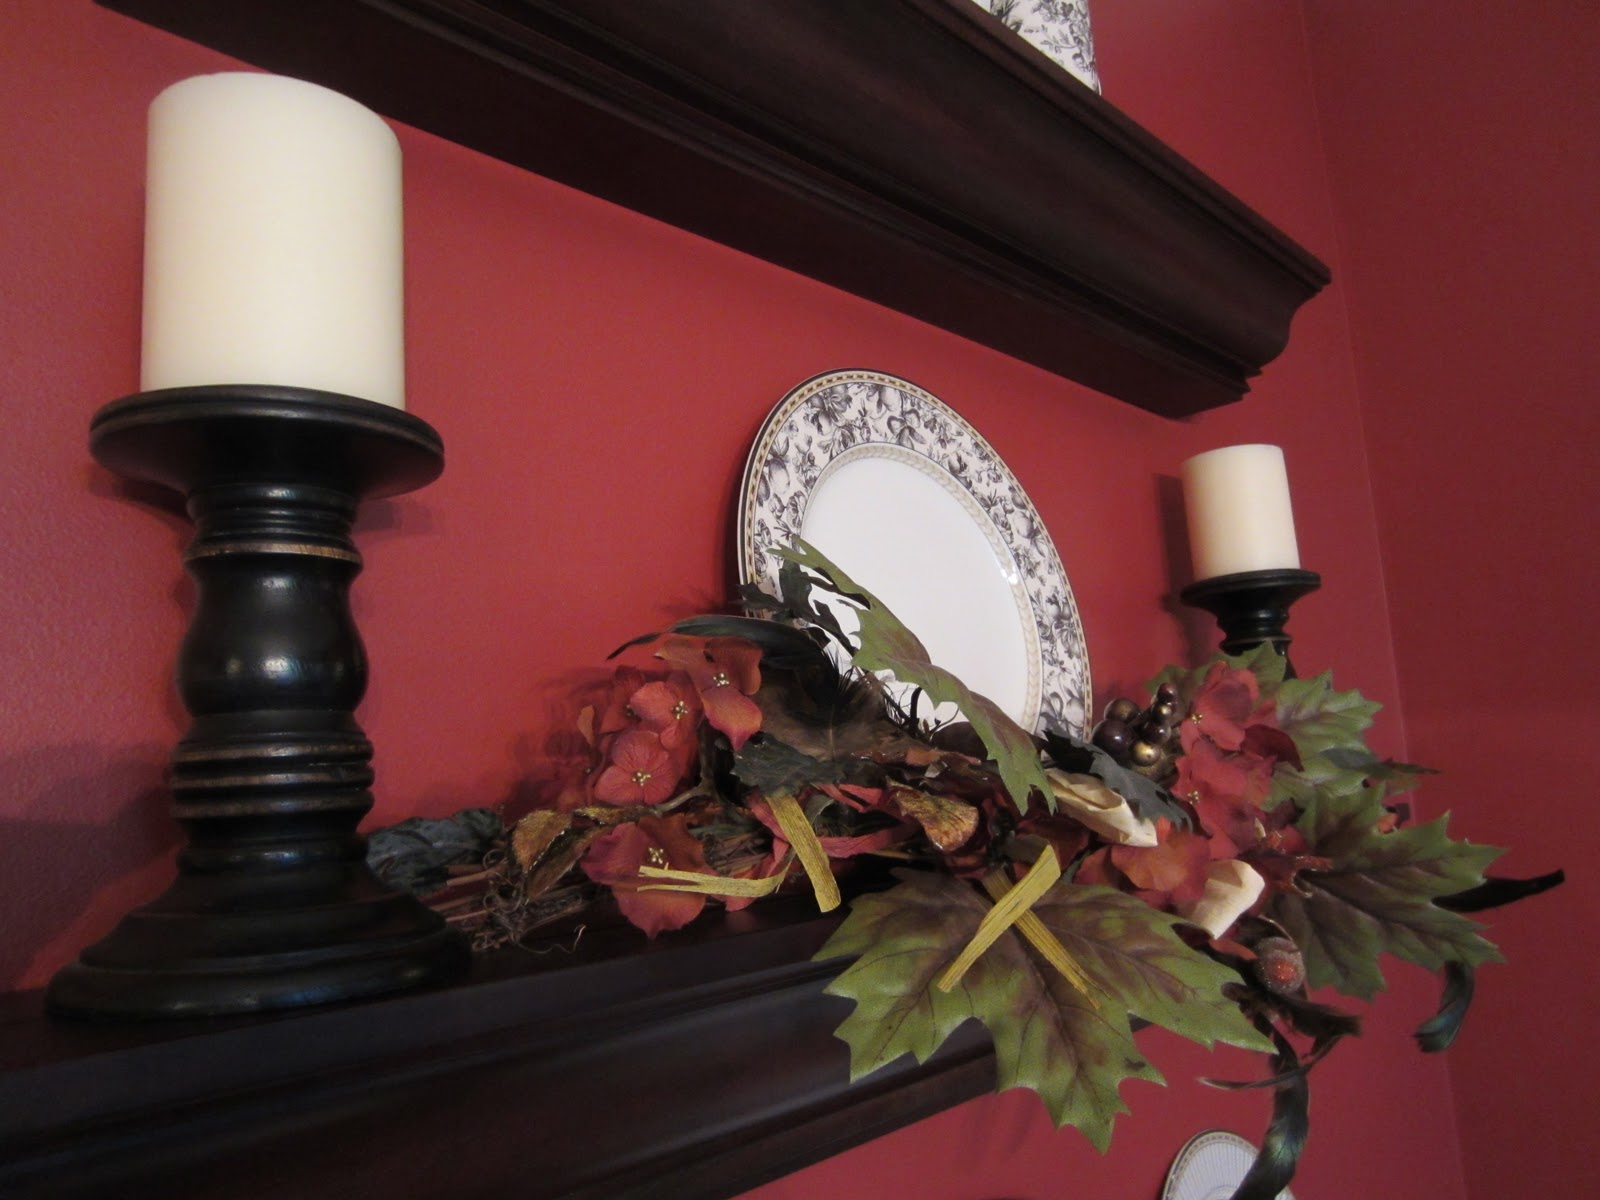 Dining Room Shelves - Fall Fluffing